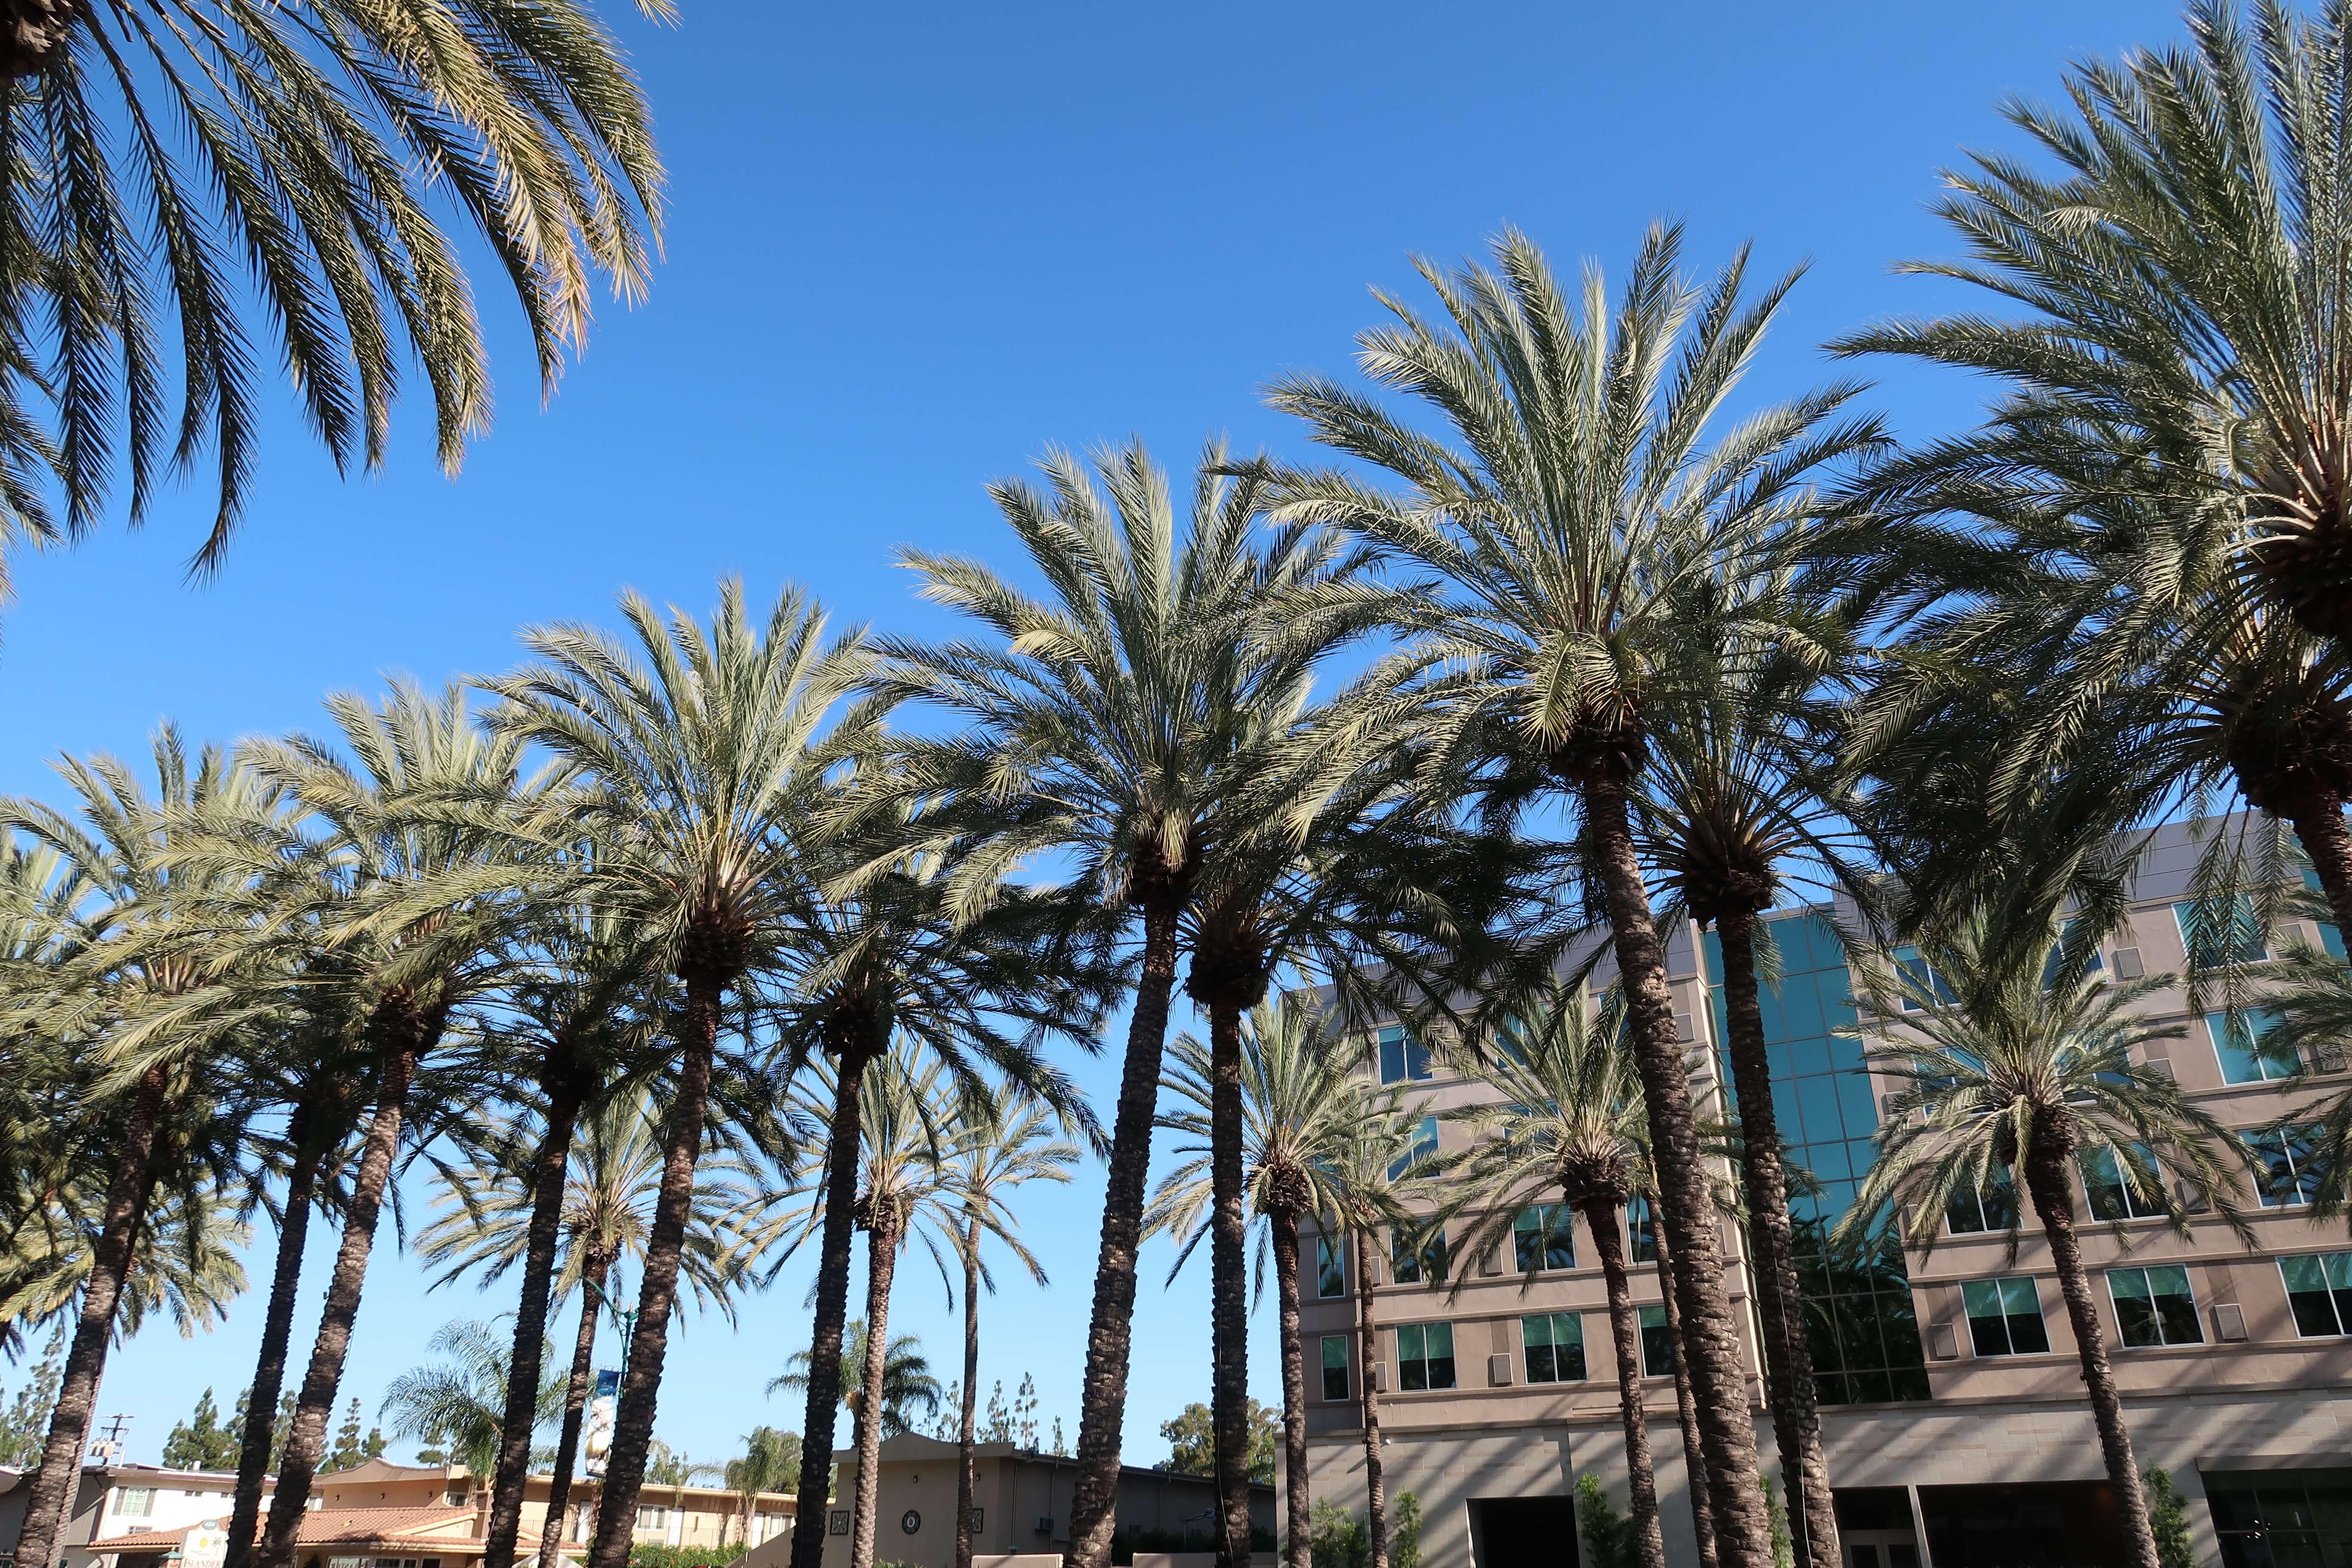 Hyatt House at Anaheim Resort near Disneyland on Katella Avenue